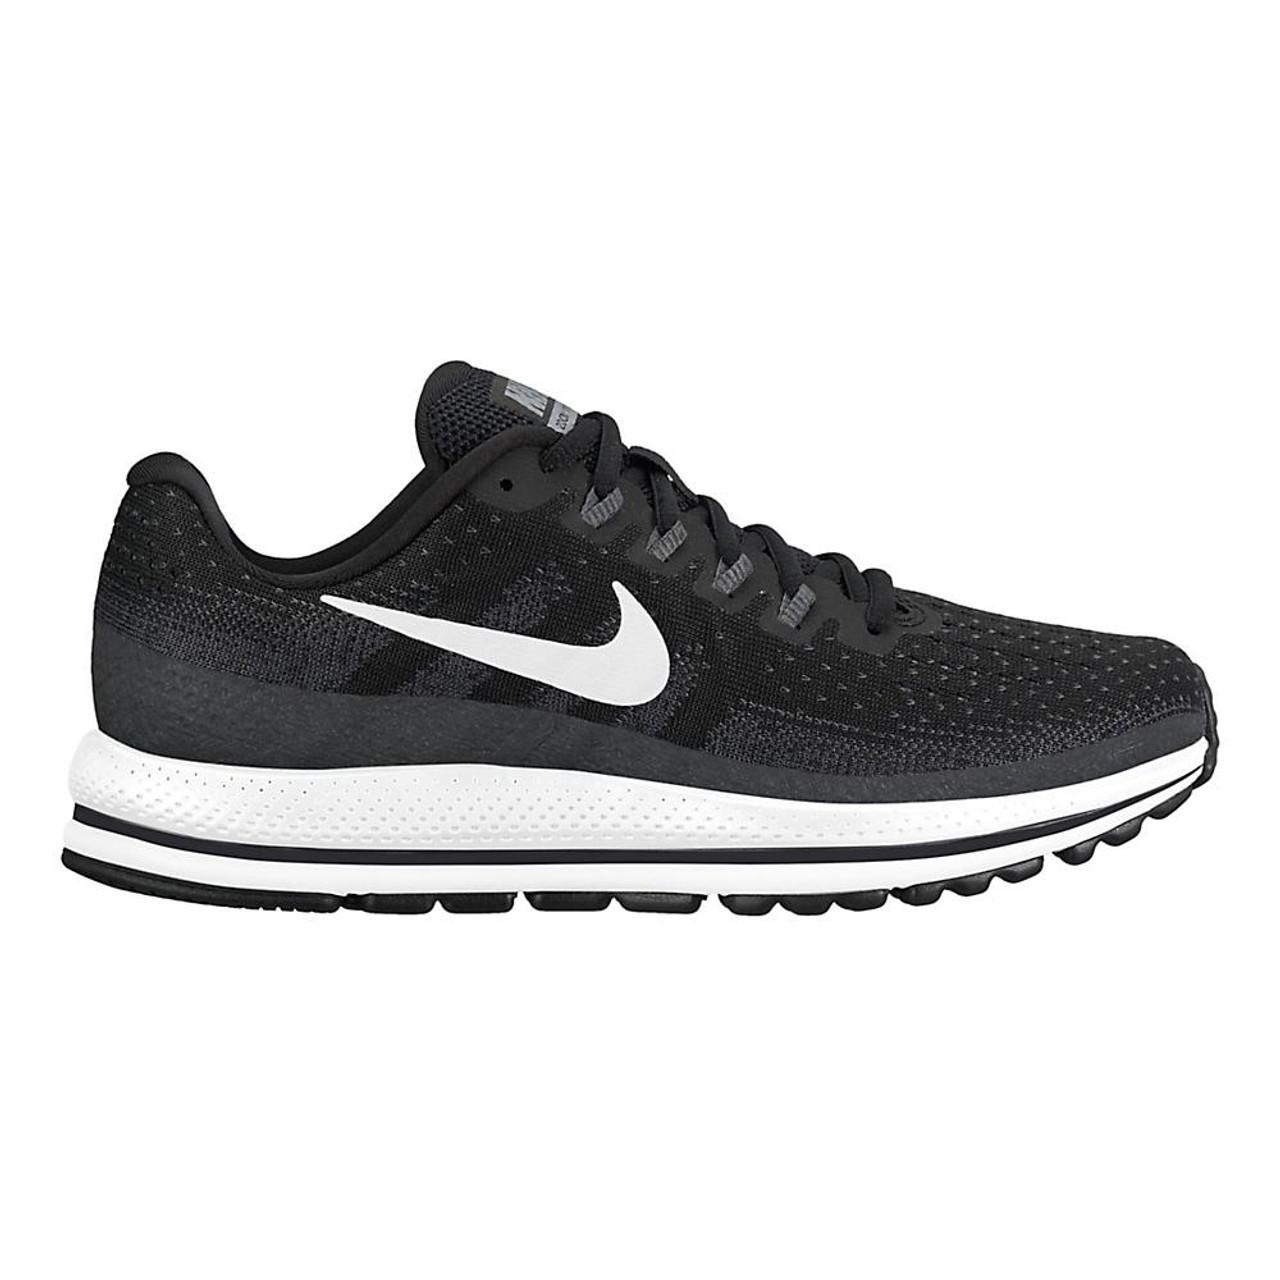 Women's Nike Air Zoom Vomero 13 | Free